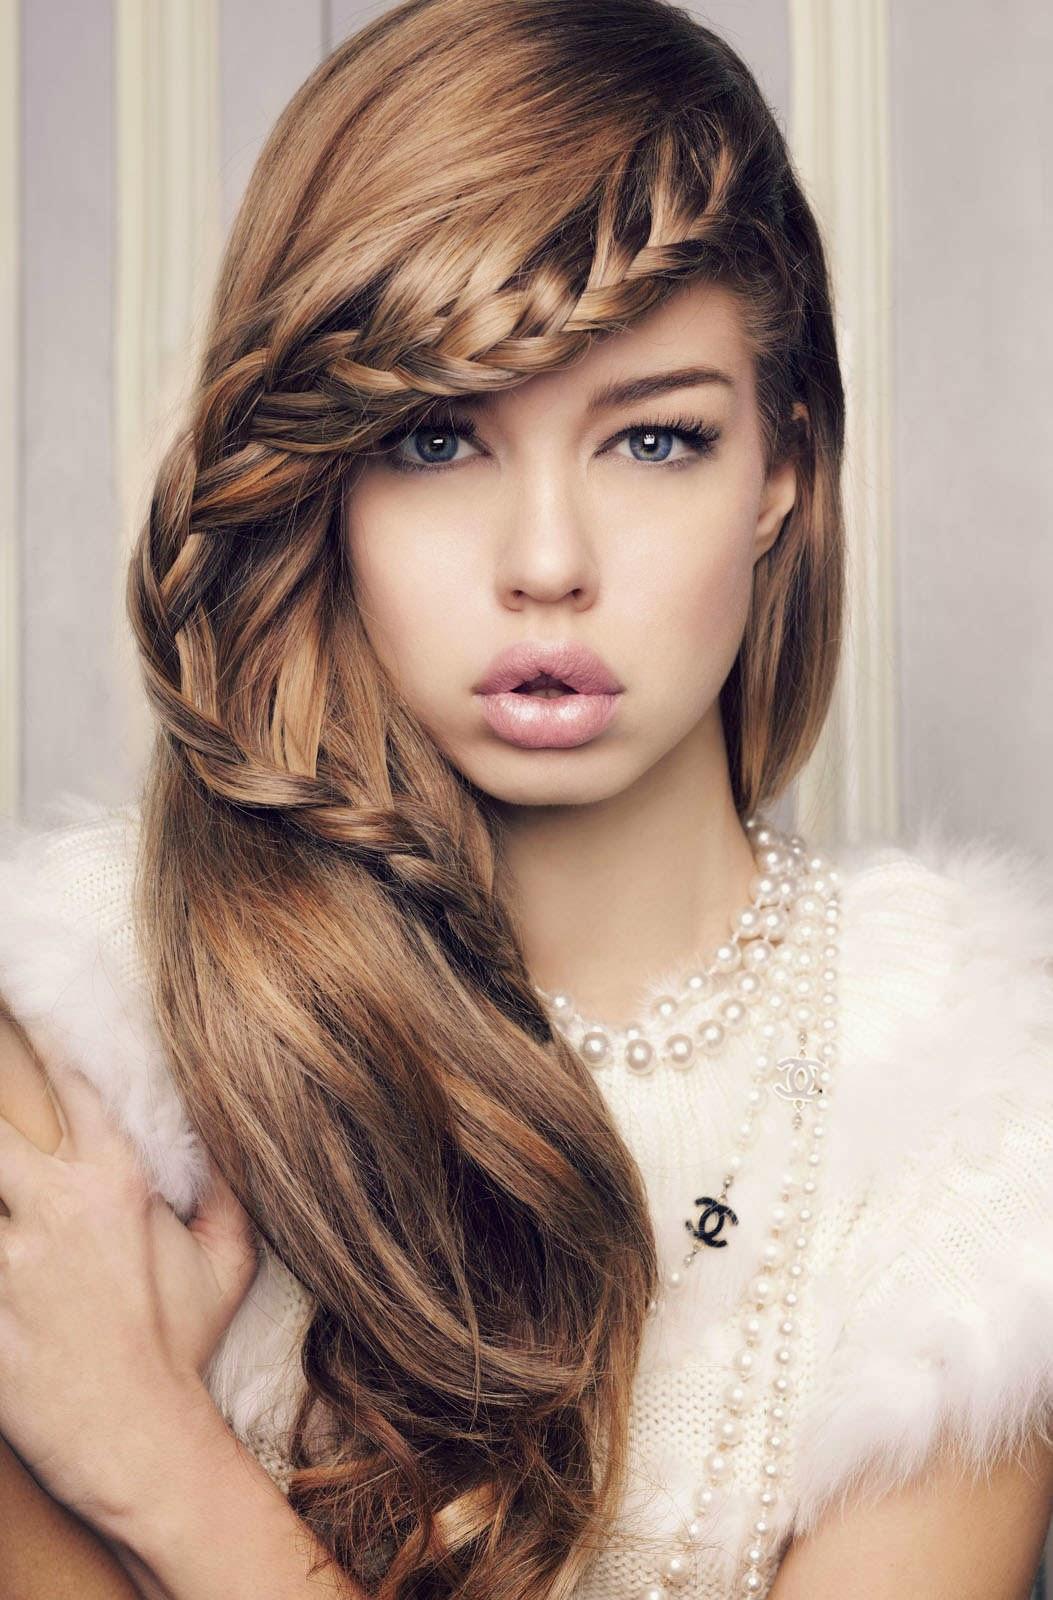 Pleasant 30 Creative Hippie Hairstyle For Short And Long Hairs Short Hairstyles Gunalazisus